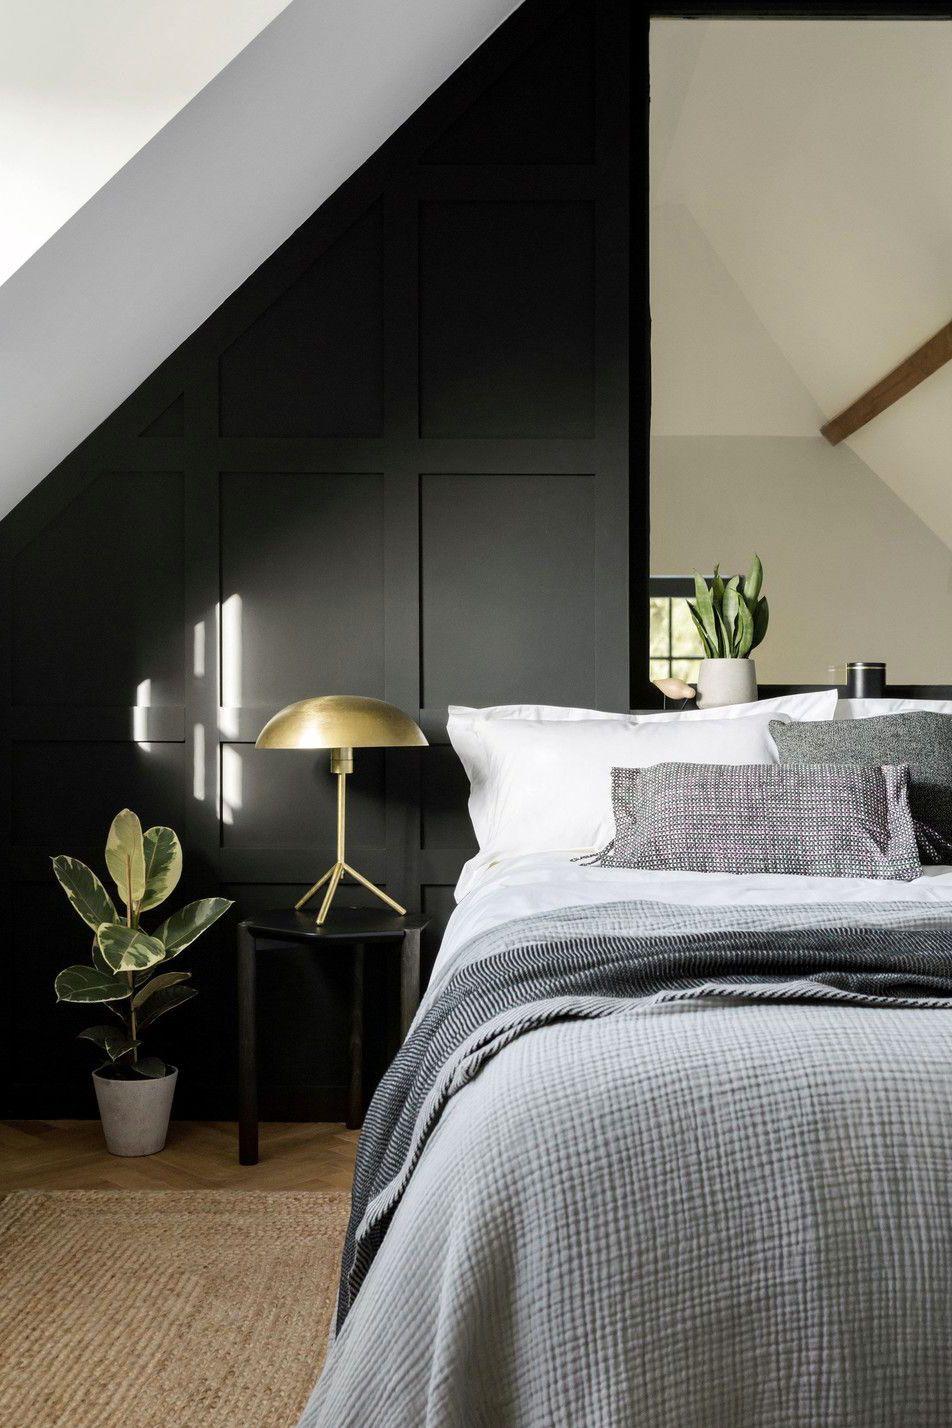 29 Awesome Black Scandinavian Interior Bedroom Design Ideas Scandinavian Interior Bedroom Bedroom Interior Bedroom Design